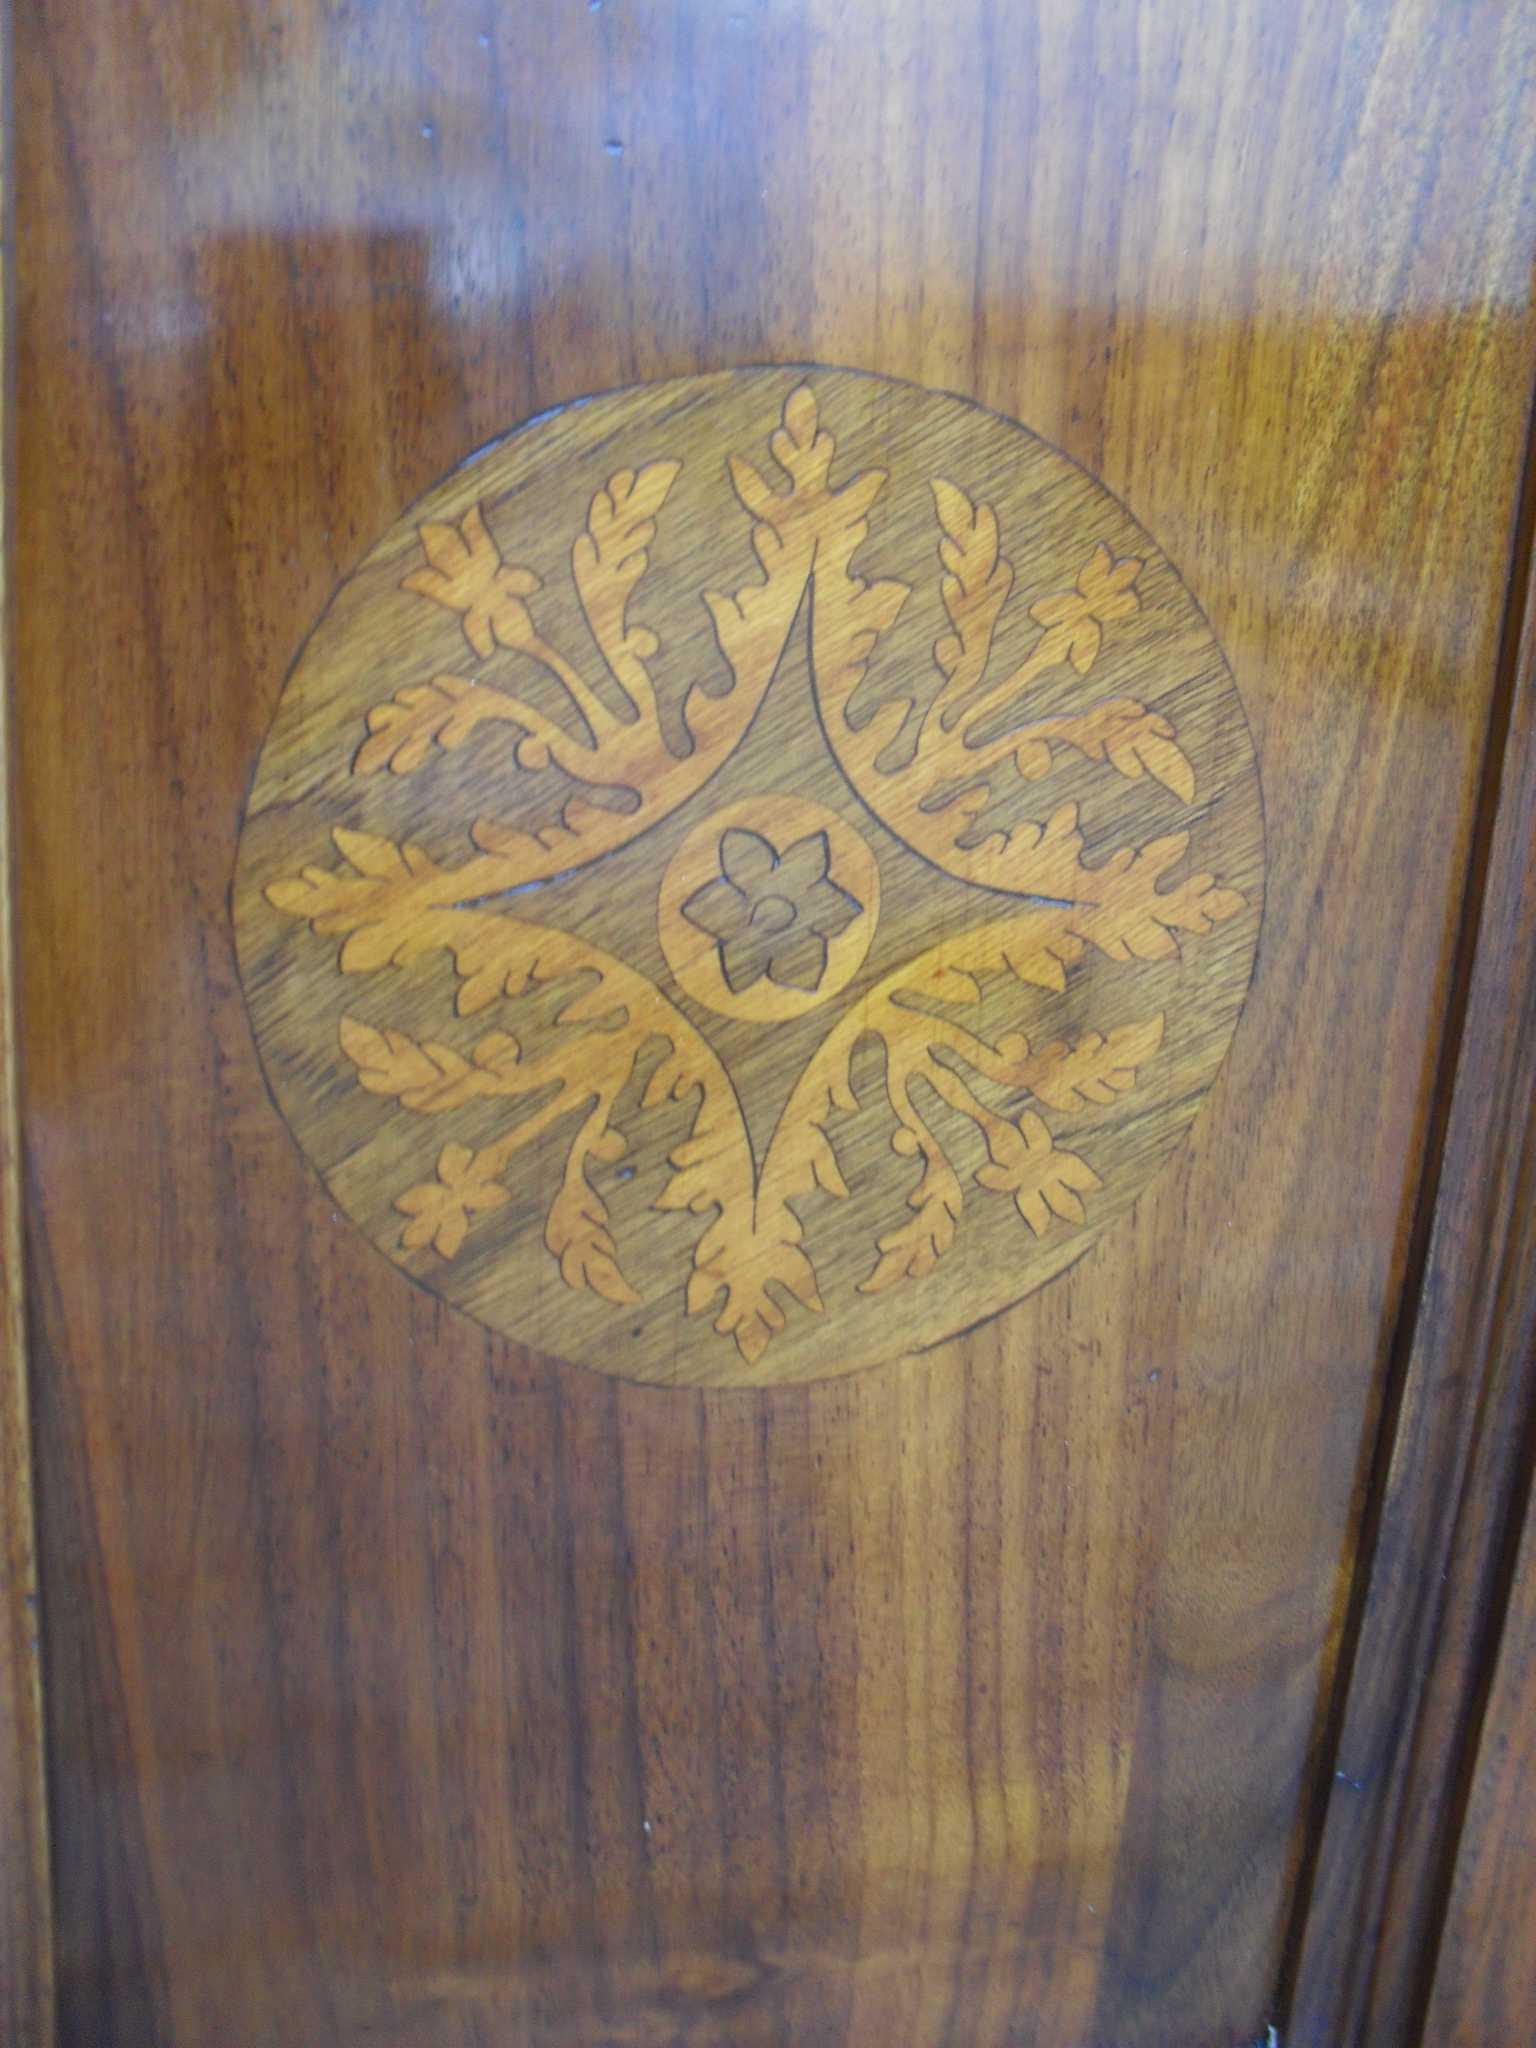 Elegante angoliera cantonale  stile luigi filippo